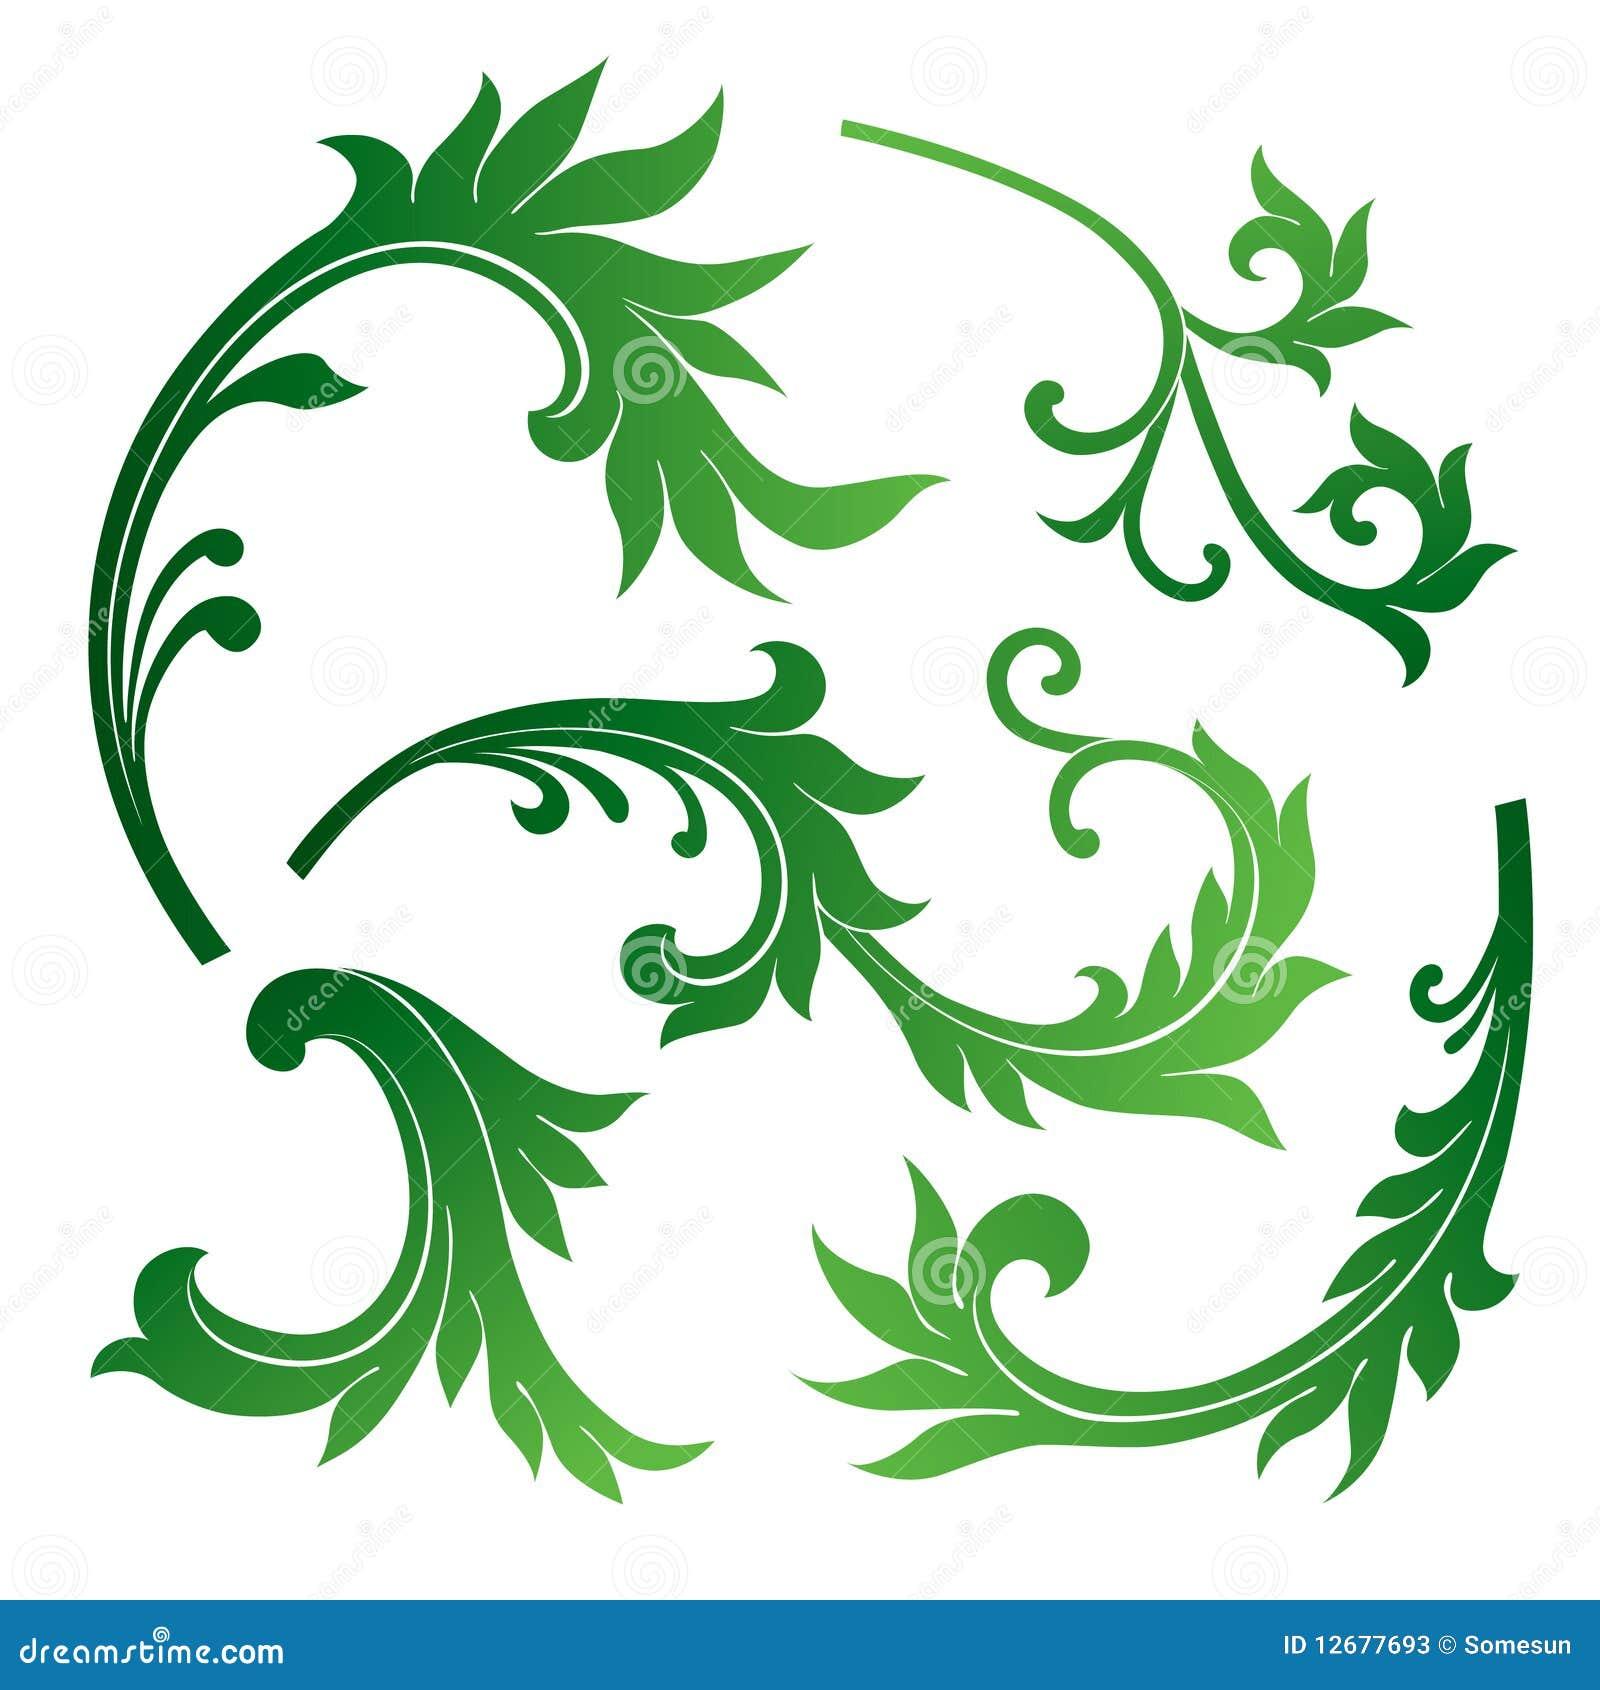 Set Of Black Flower Design Elements Vector Illustration: Vector Set Of Floral Design Elements Stock Vector